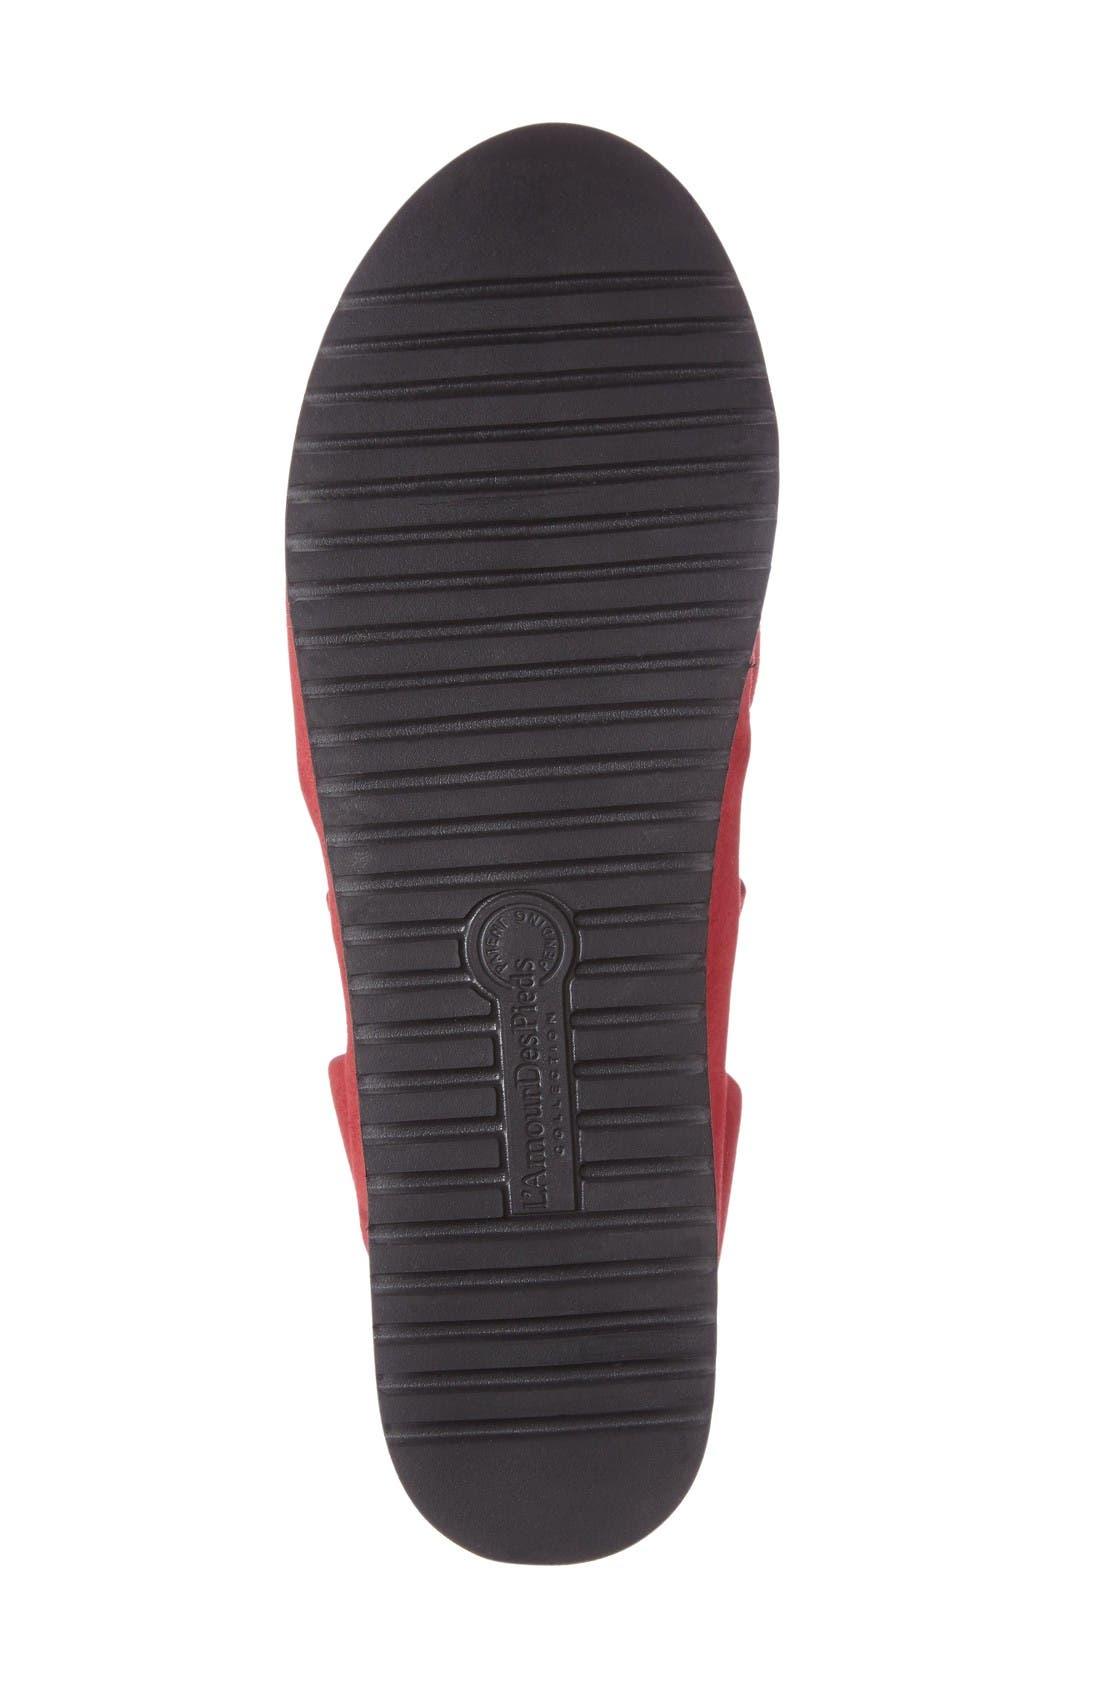 Adelais Platform Wedge Sandal,                             Alternate thumbnail 4, color,                             Red Nubuck Leather